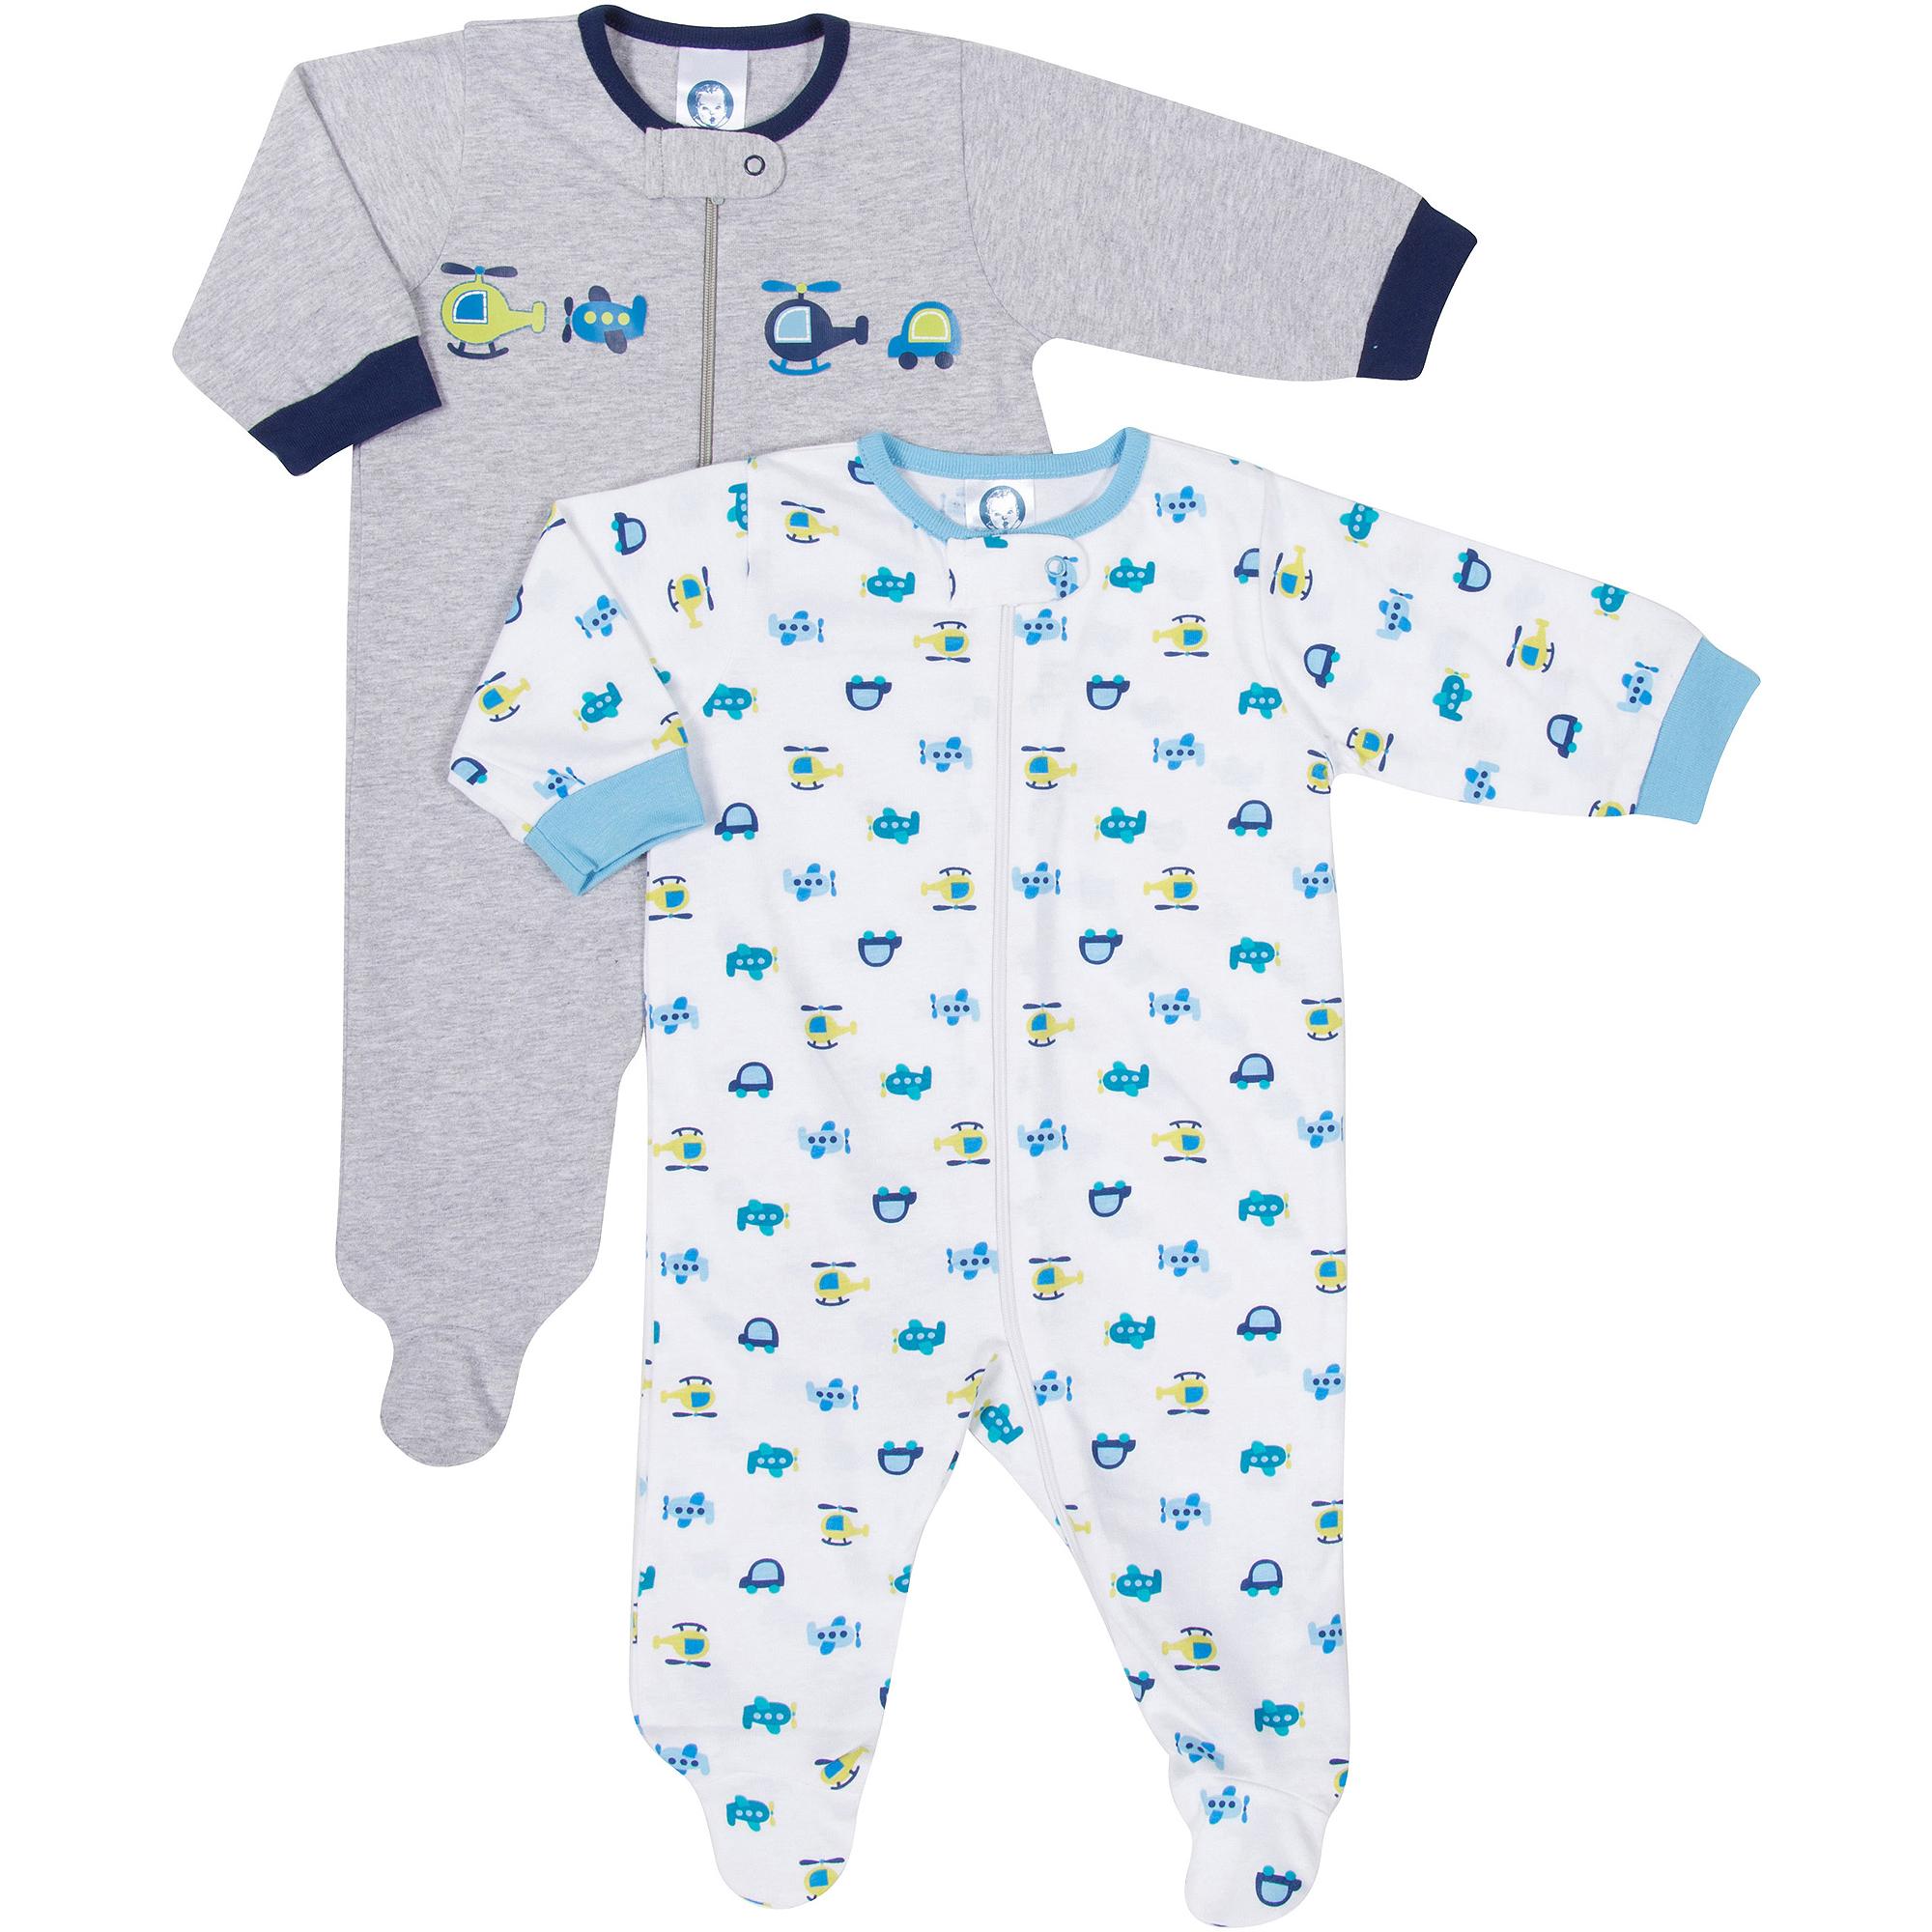 Gerber Newborn Baby Boy Sleep n' Play, 2-Pack